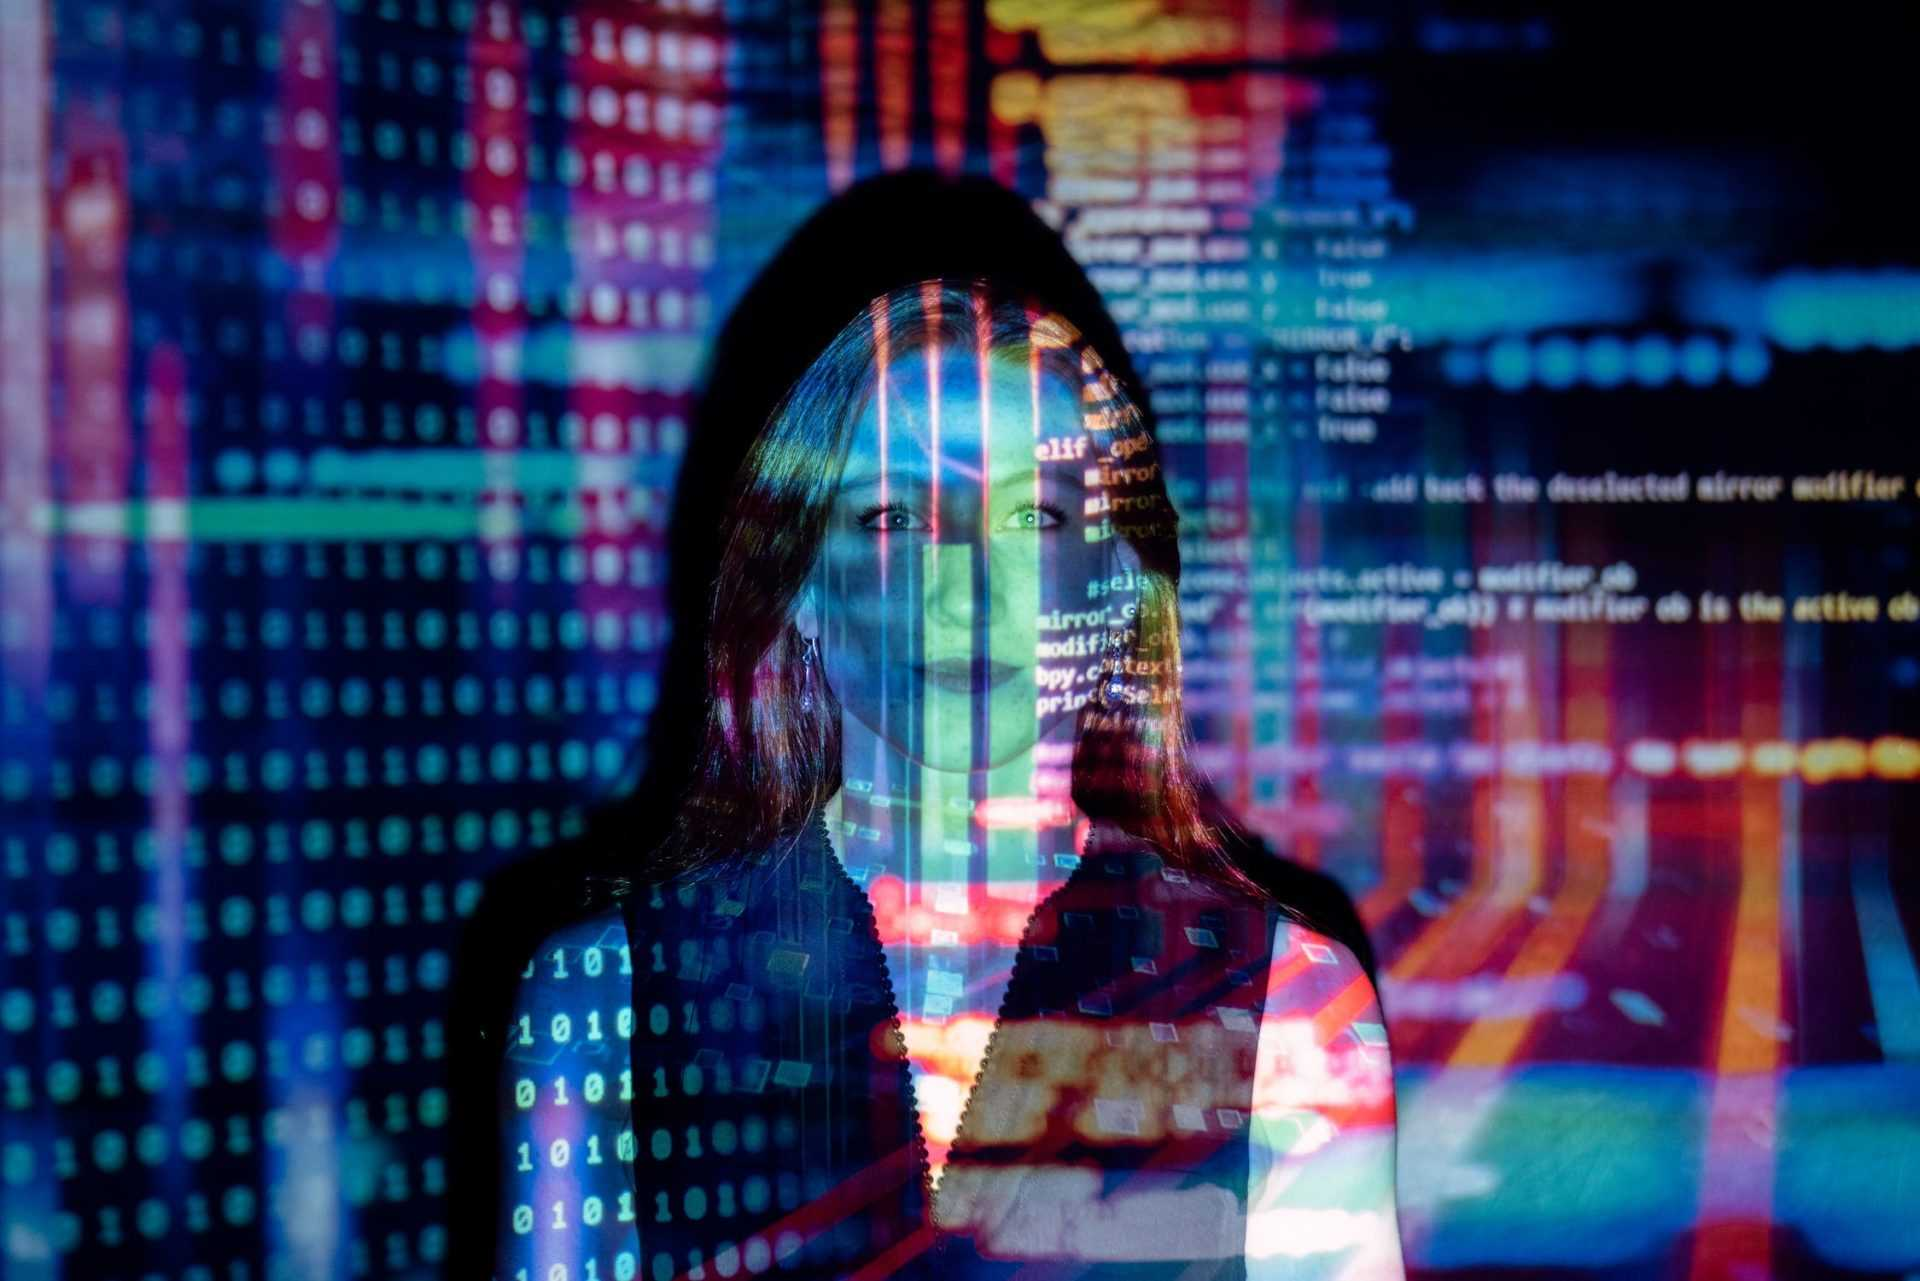 Технологии во время пандемии